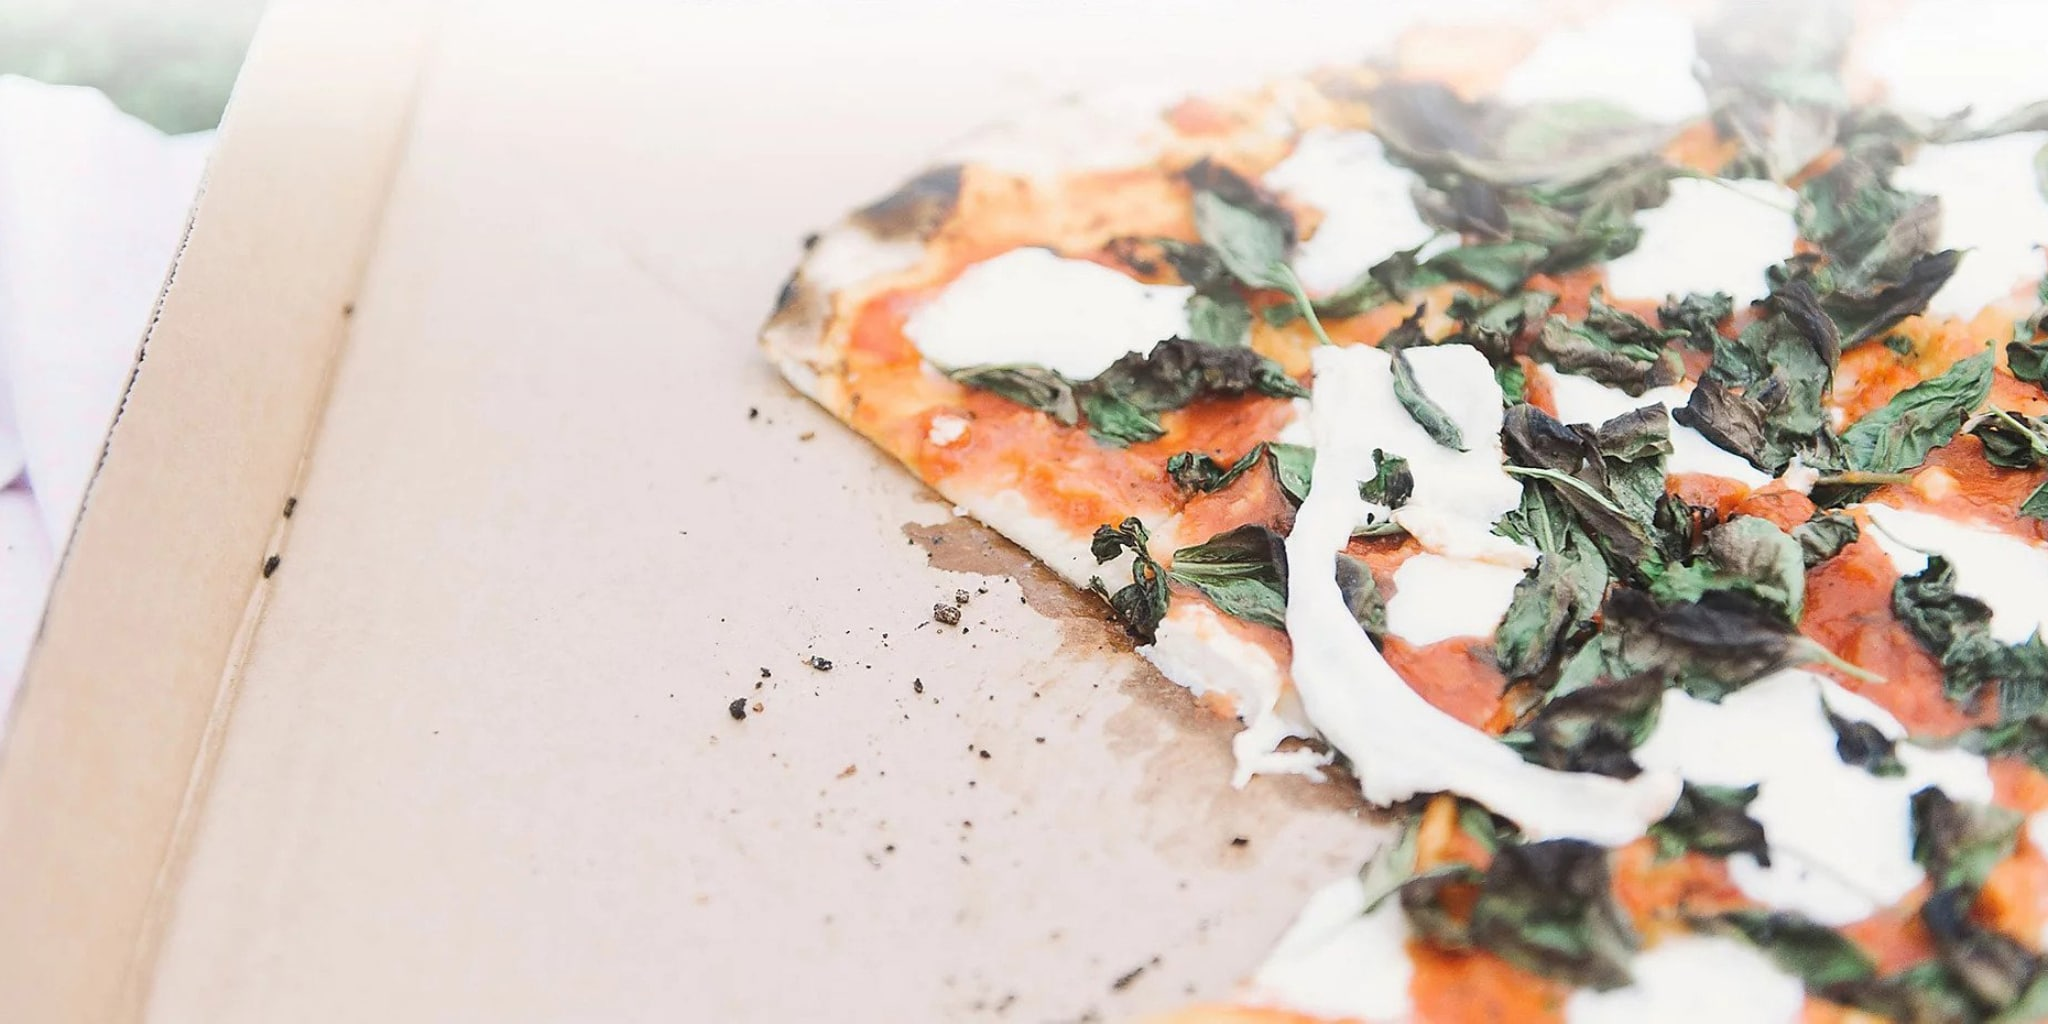 pleasant-grove-pizza-farm-8-2048x1024_c